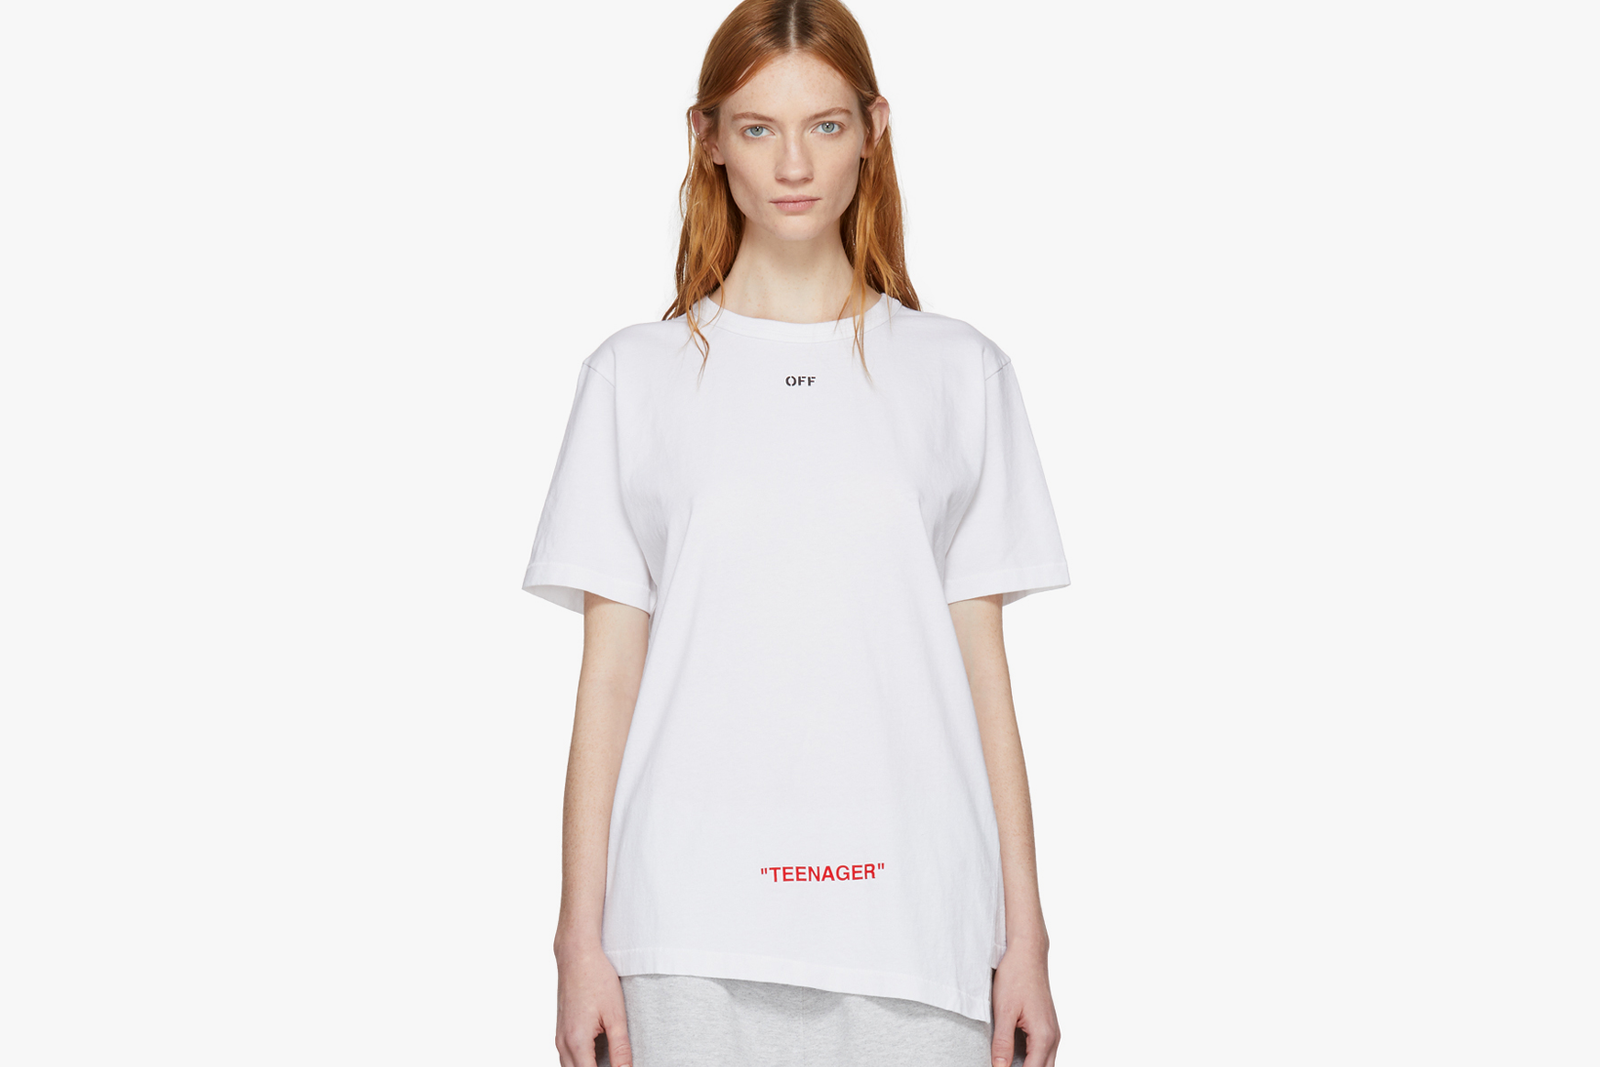 Woman Supreme T Shirt London Fashion Week Spring Summer 2019